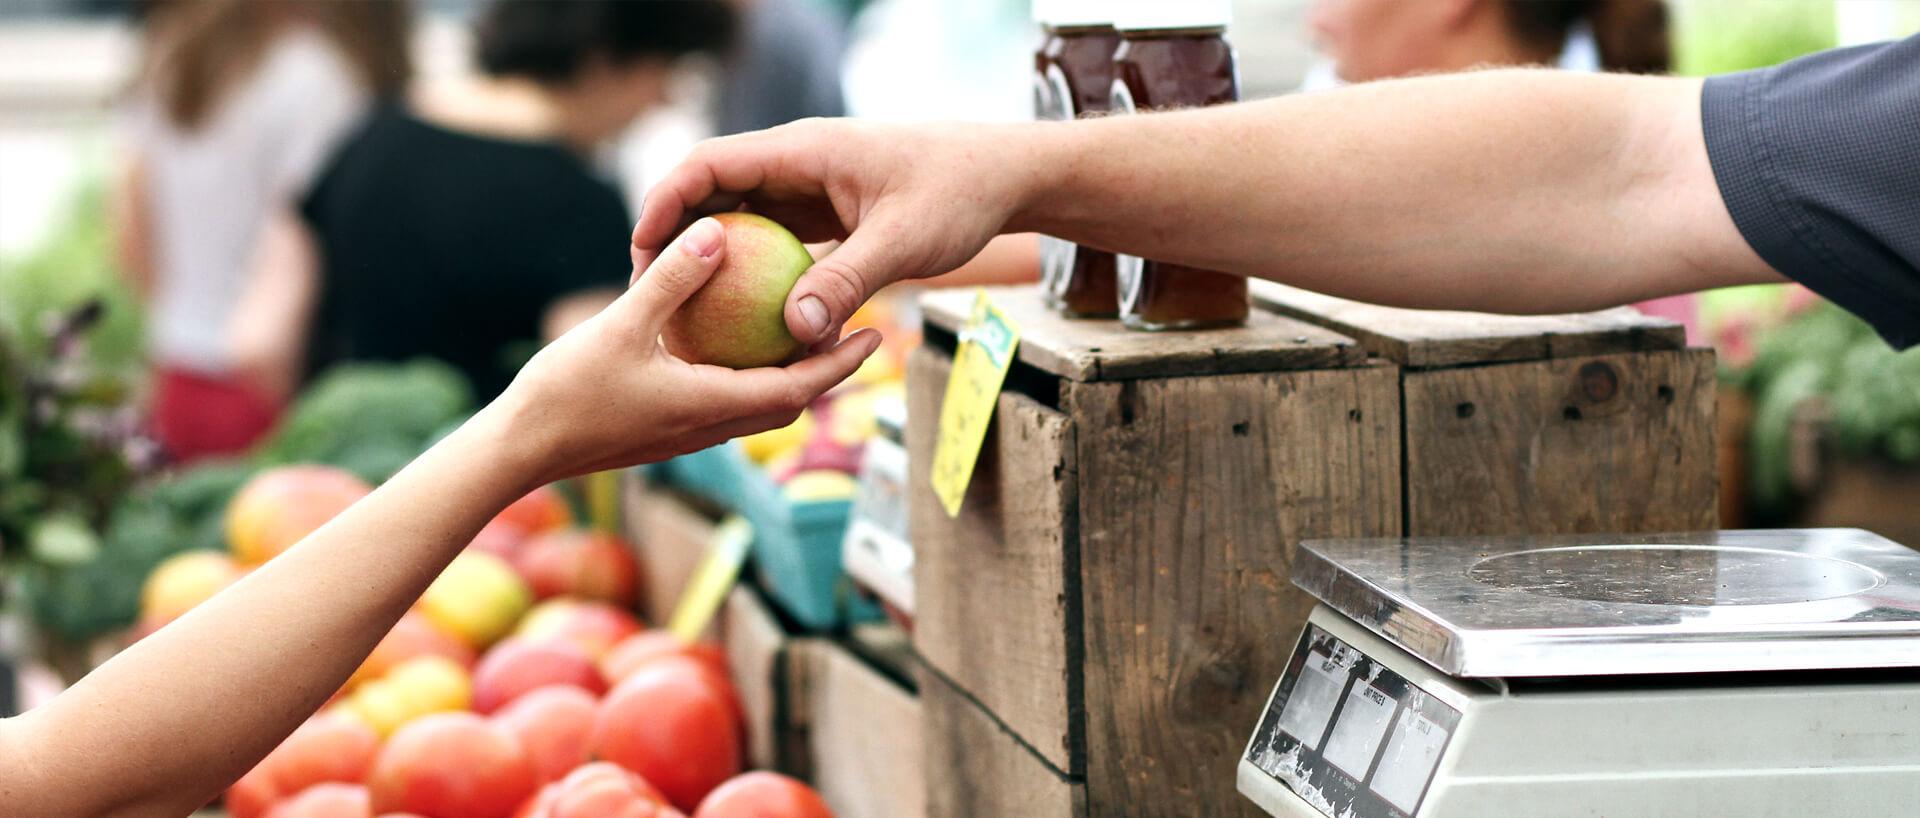 grocer handing an apple to a customer